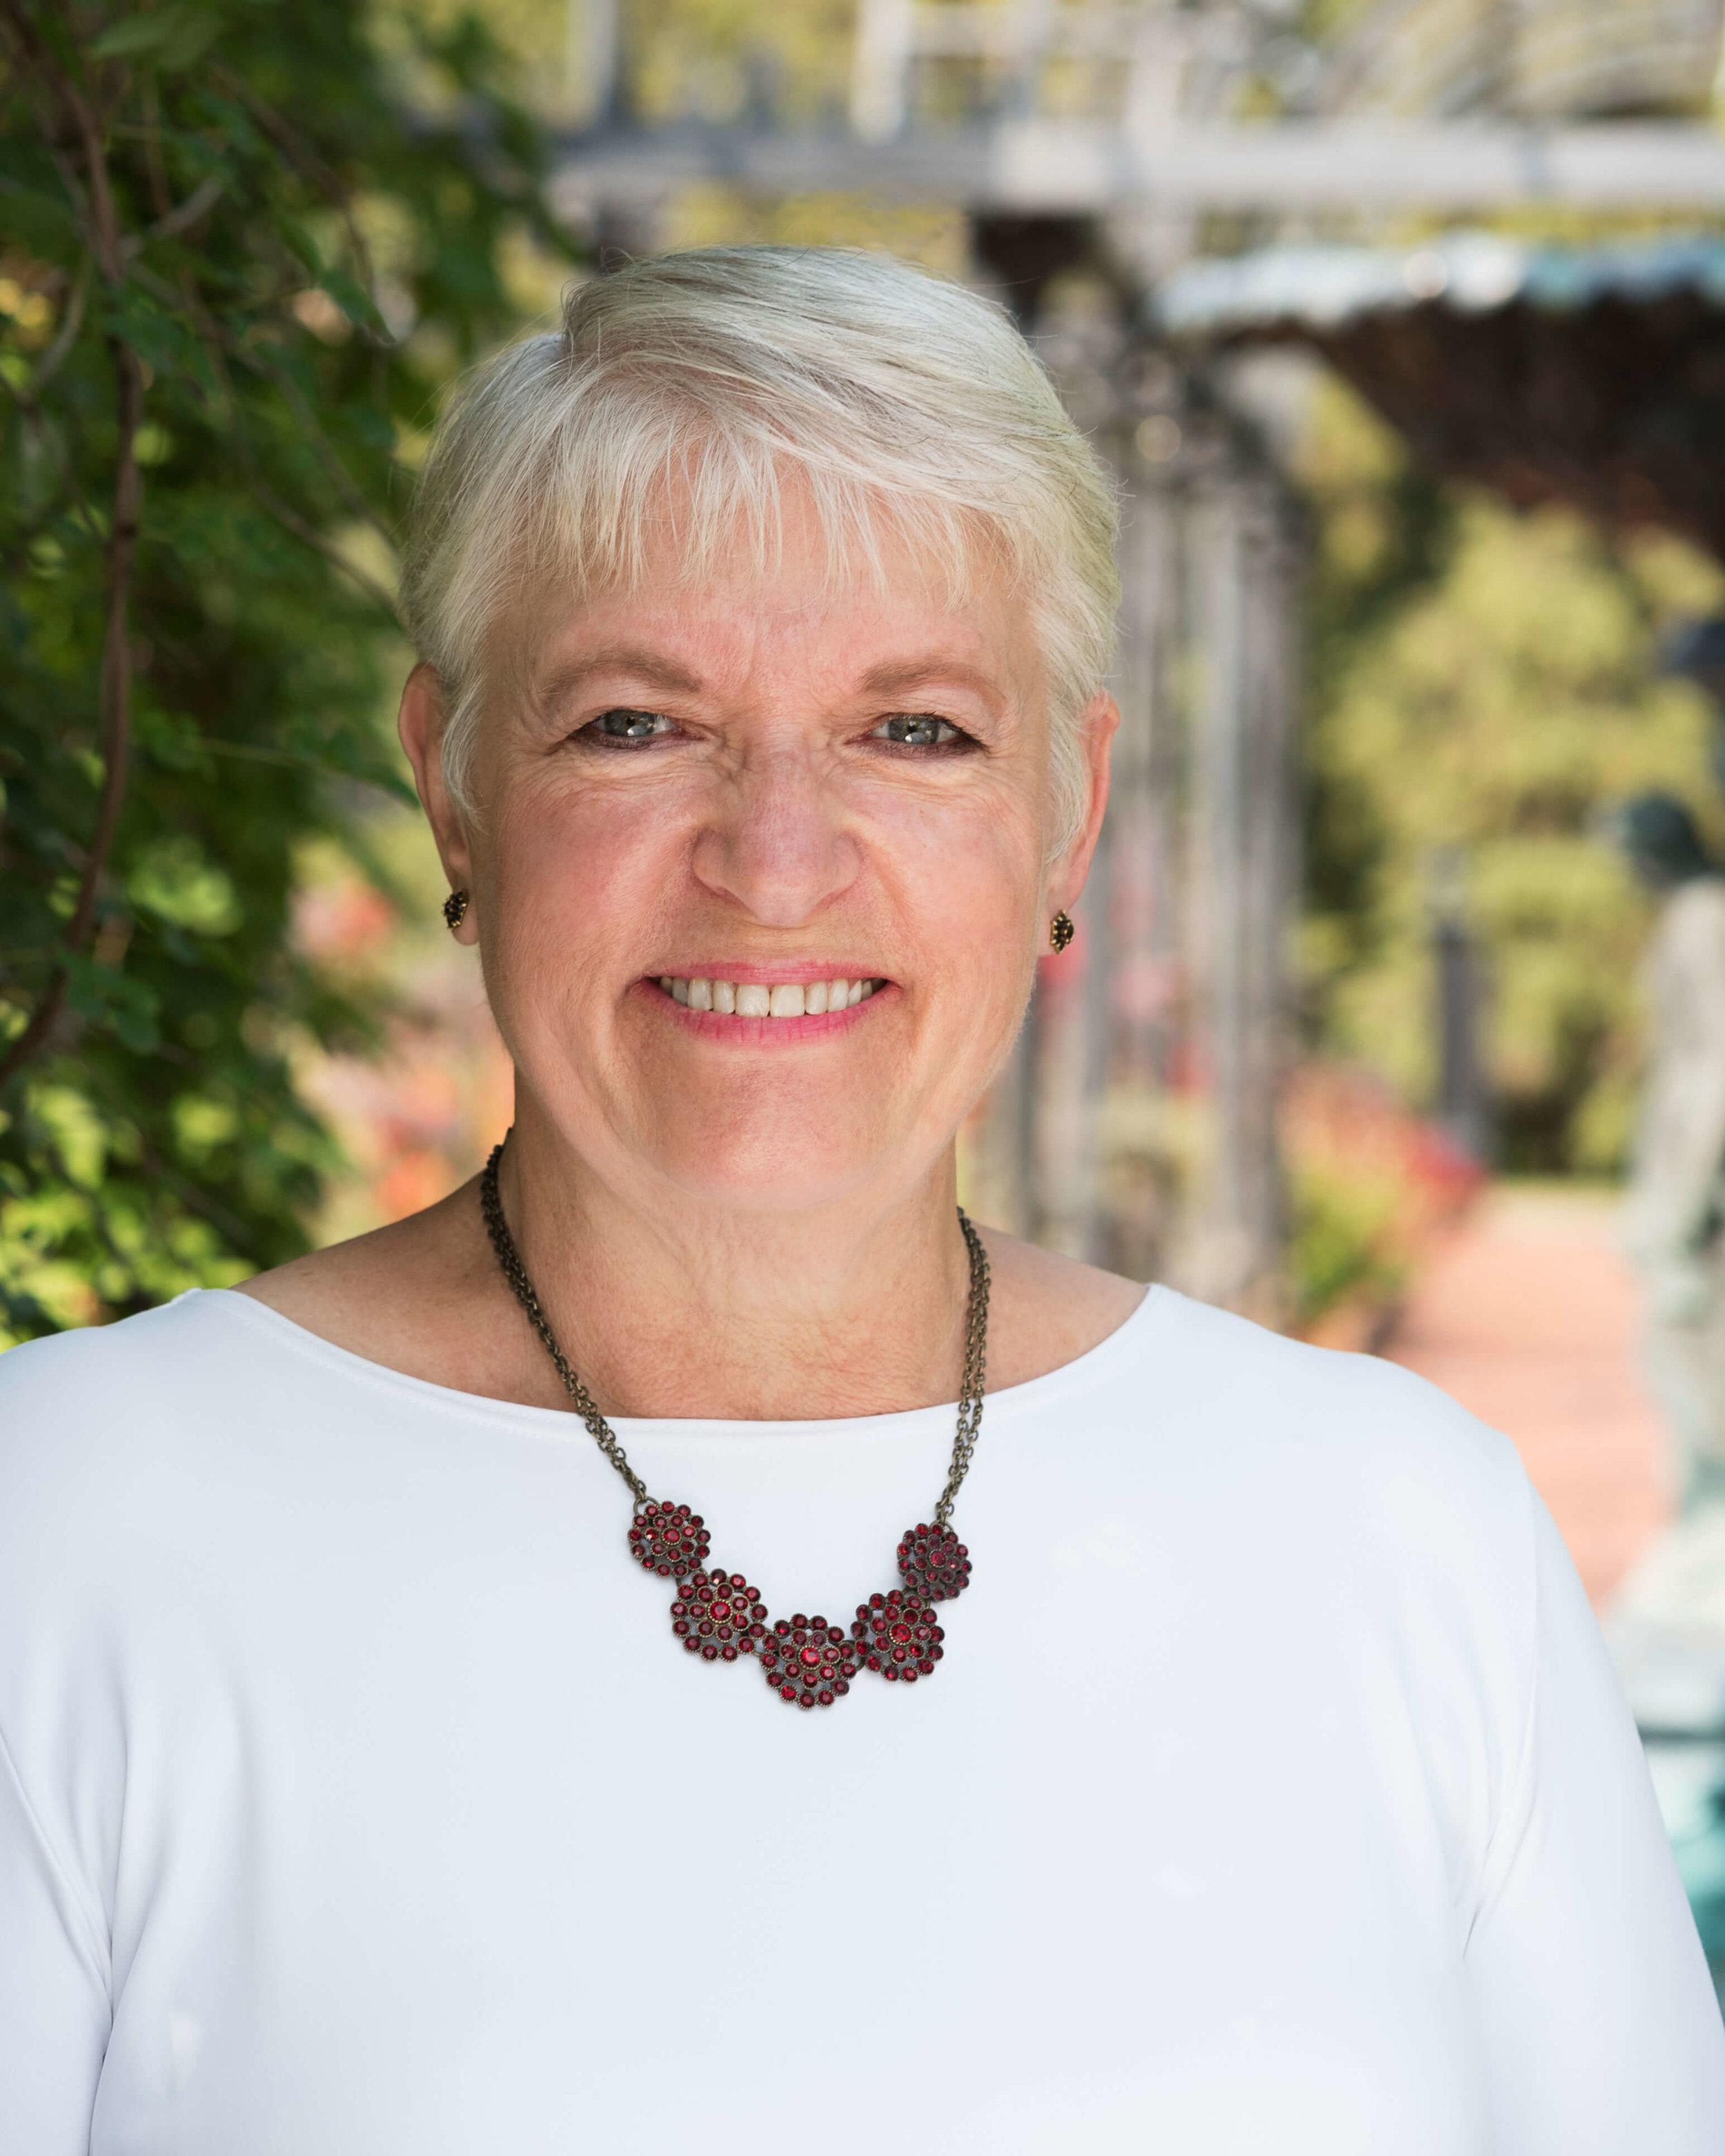 Renata Ritter, Author and Spiritual Trainer